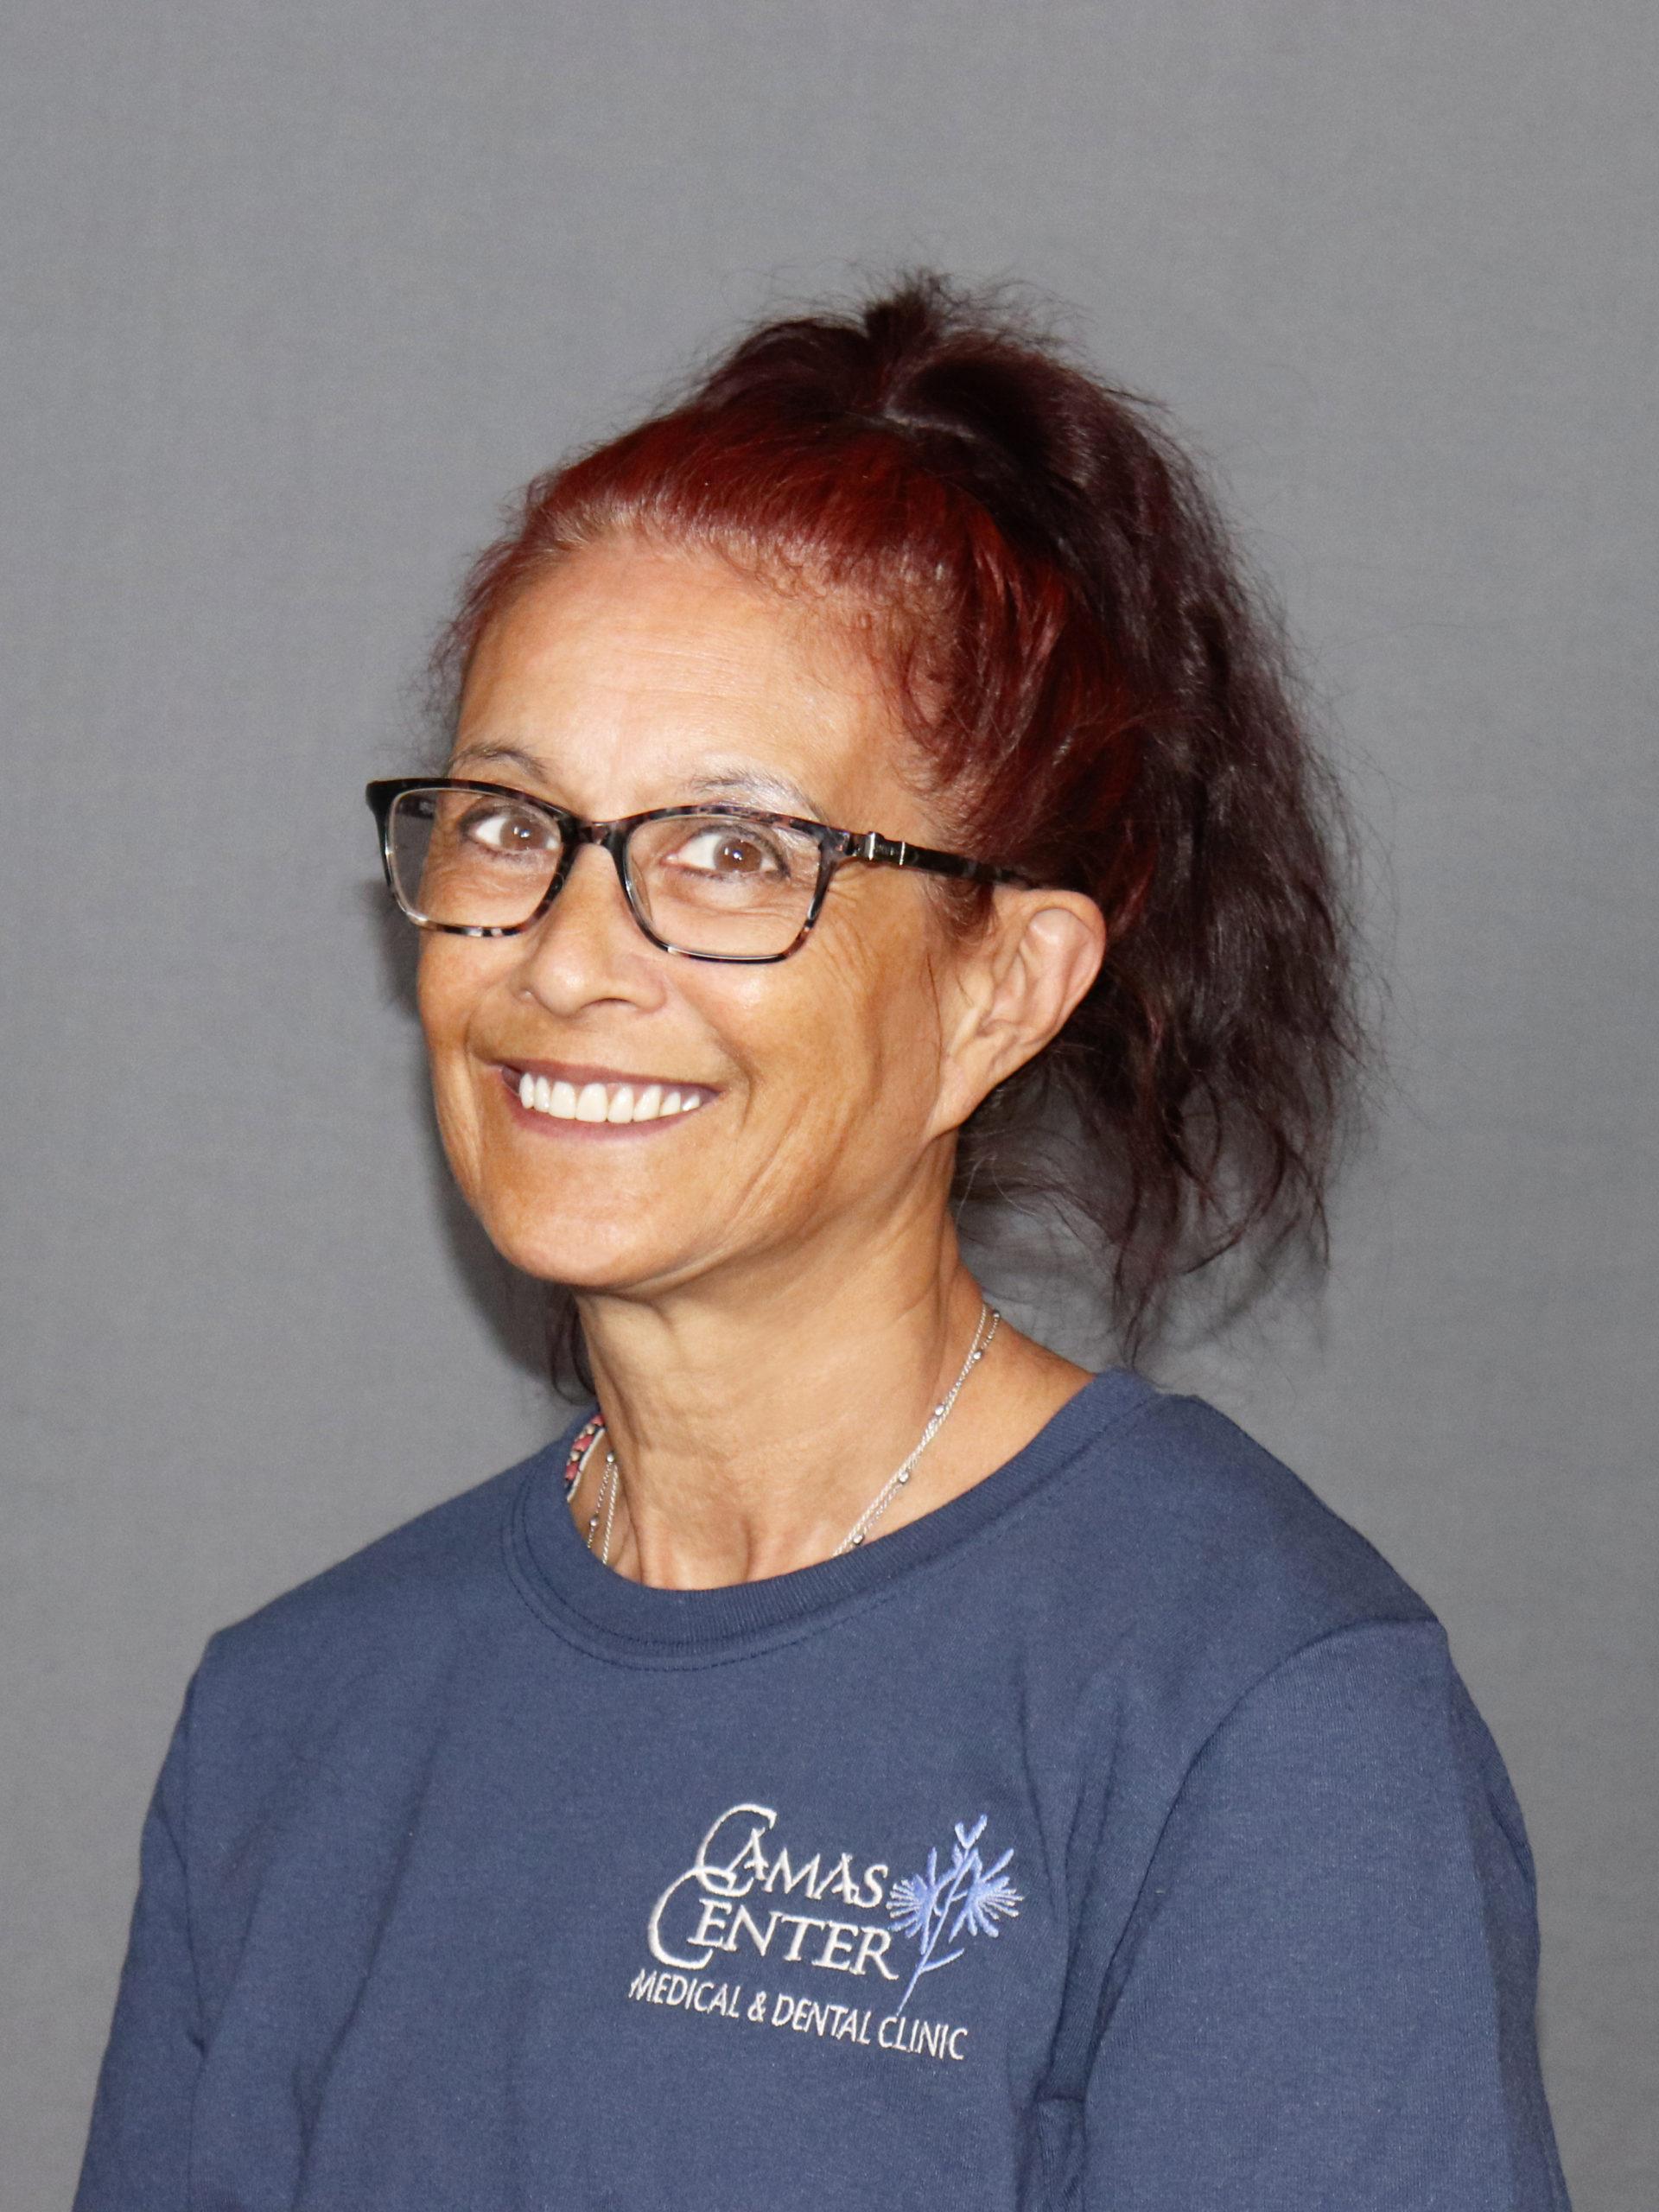 Vicki Steff